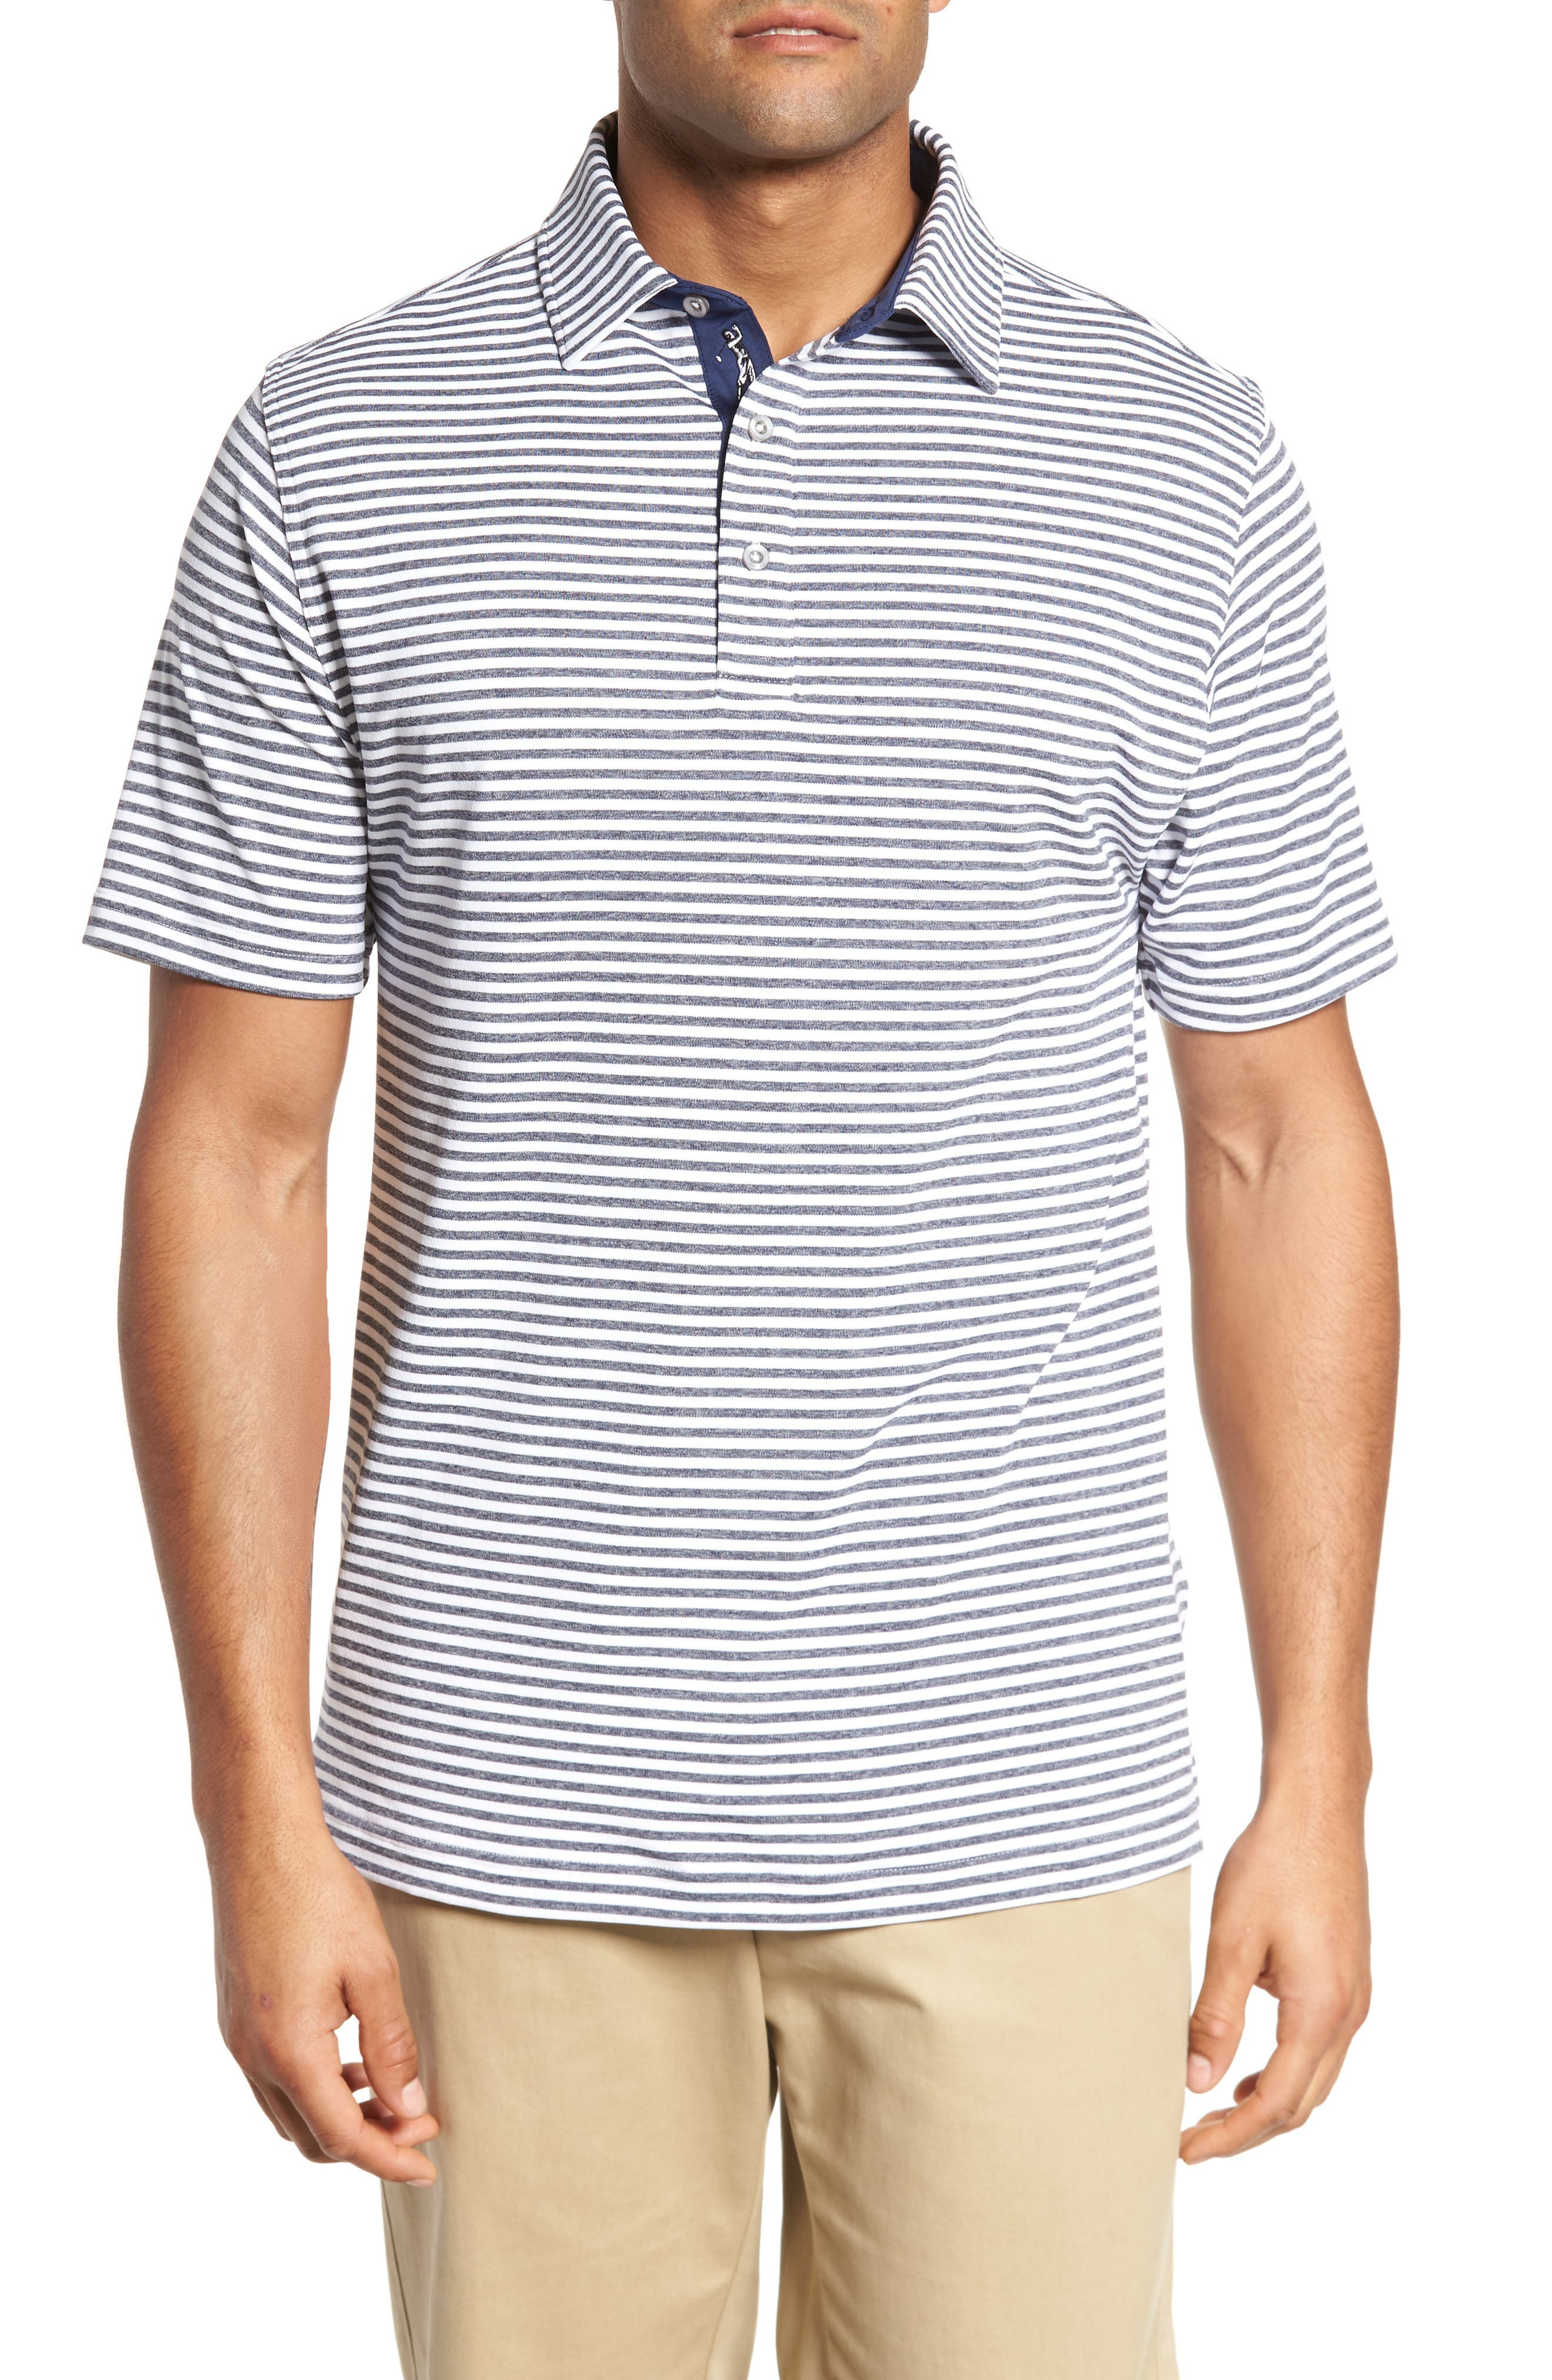 Alternate Image 1 Selected - Bobby Jones XH2O Tranquil Stripe Jersey Polo